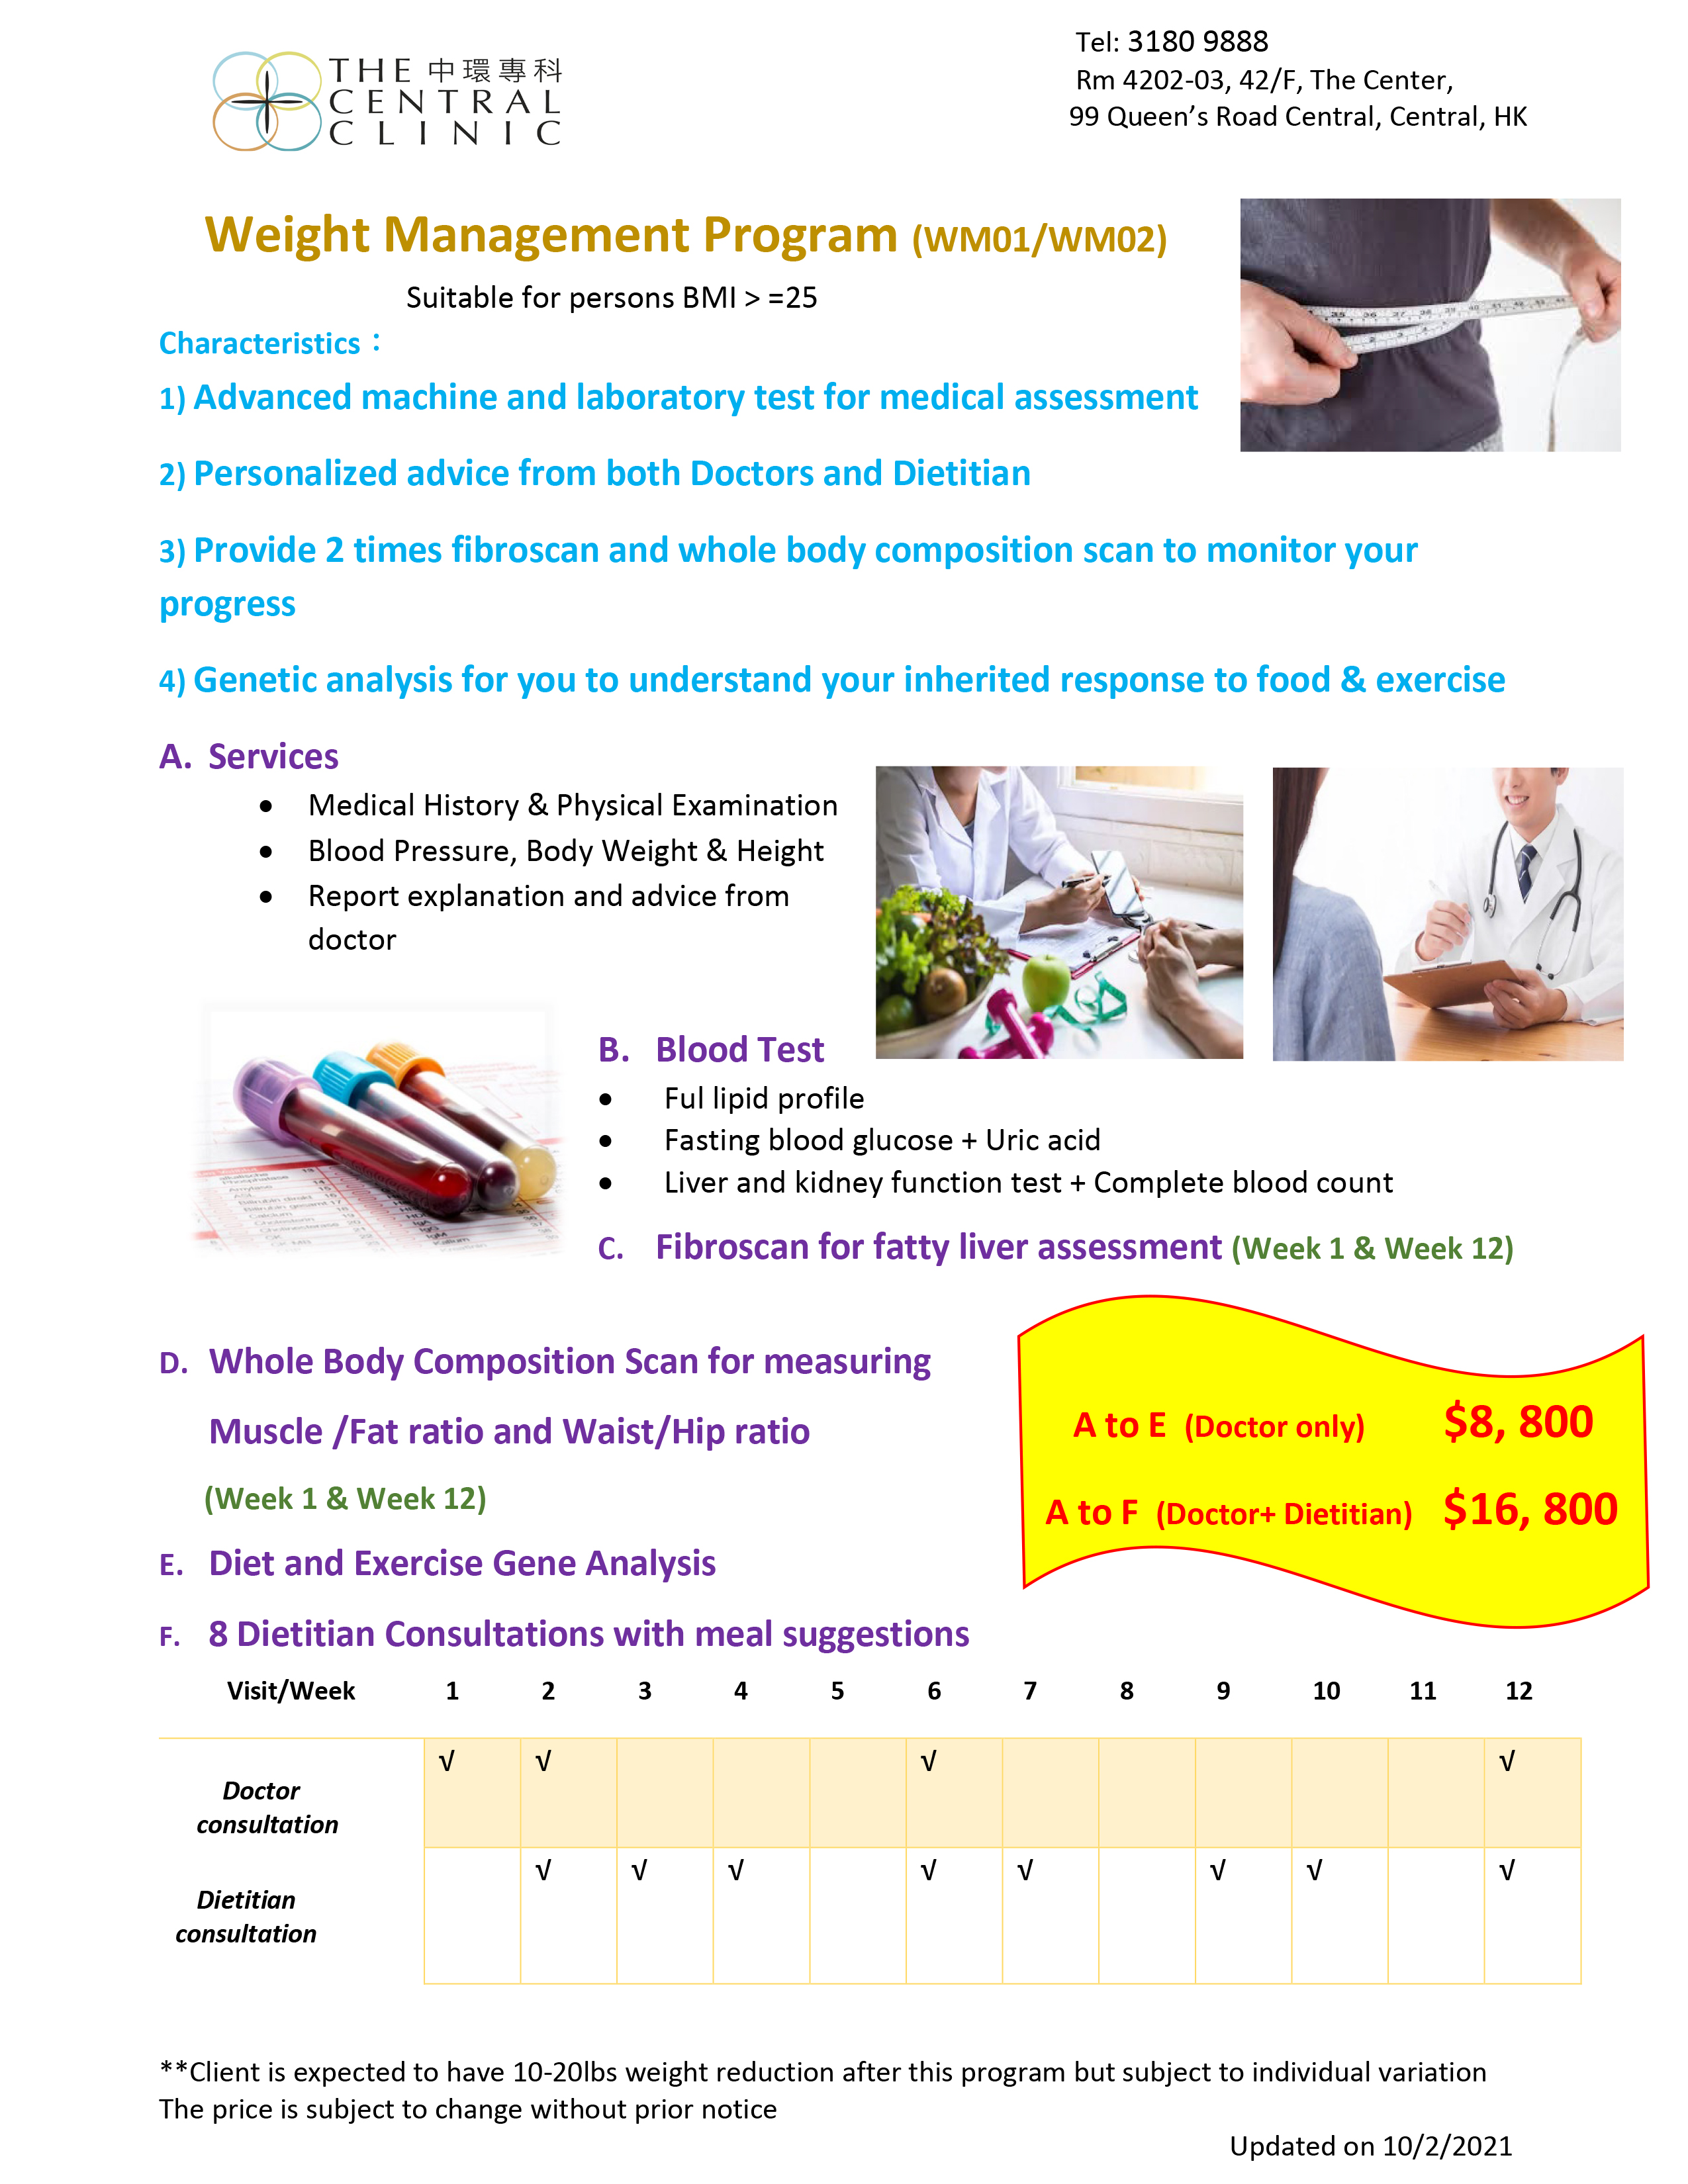 TCC - Weight Management Program Page 1